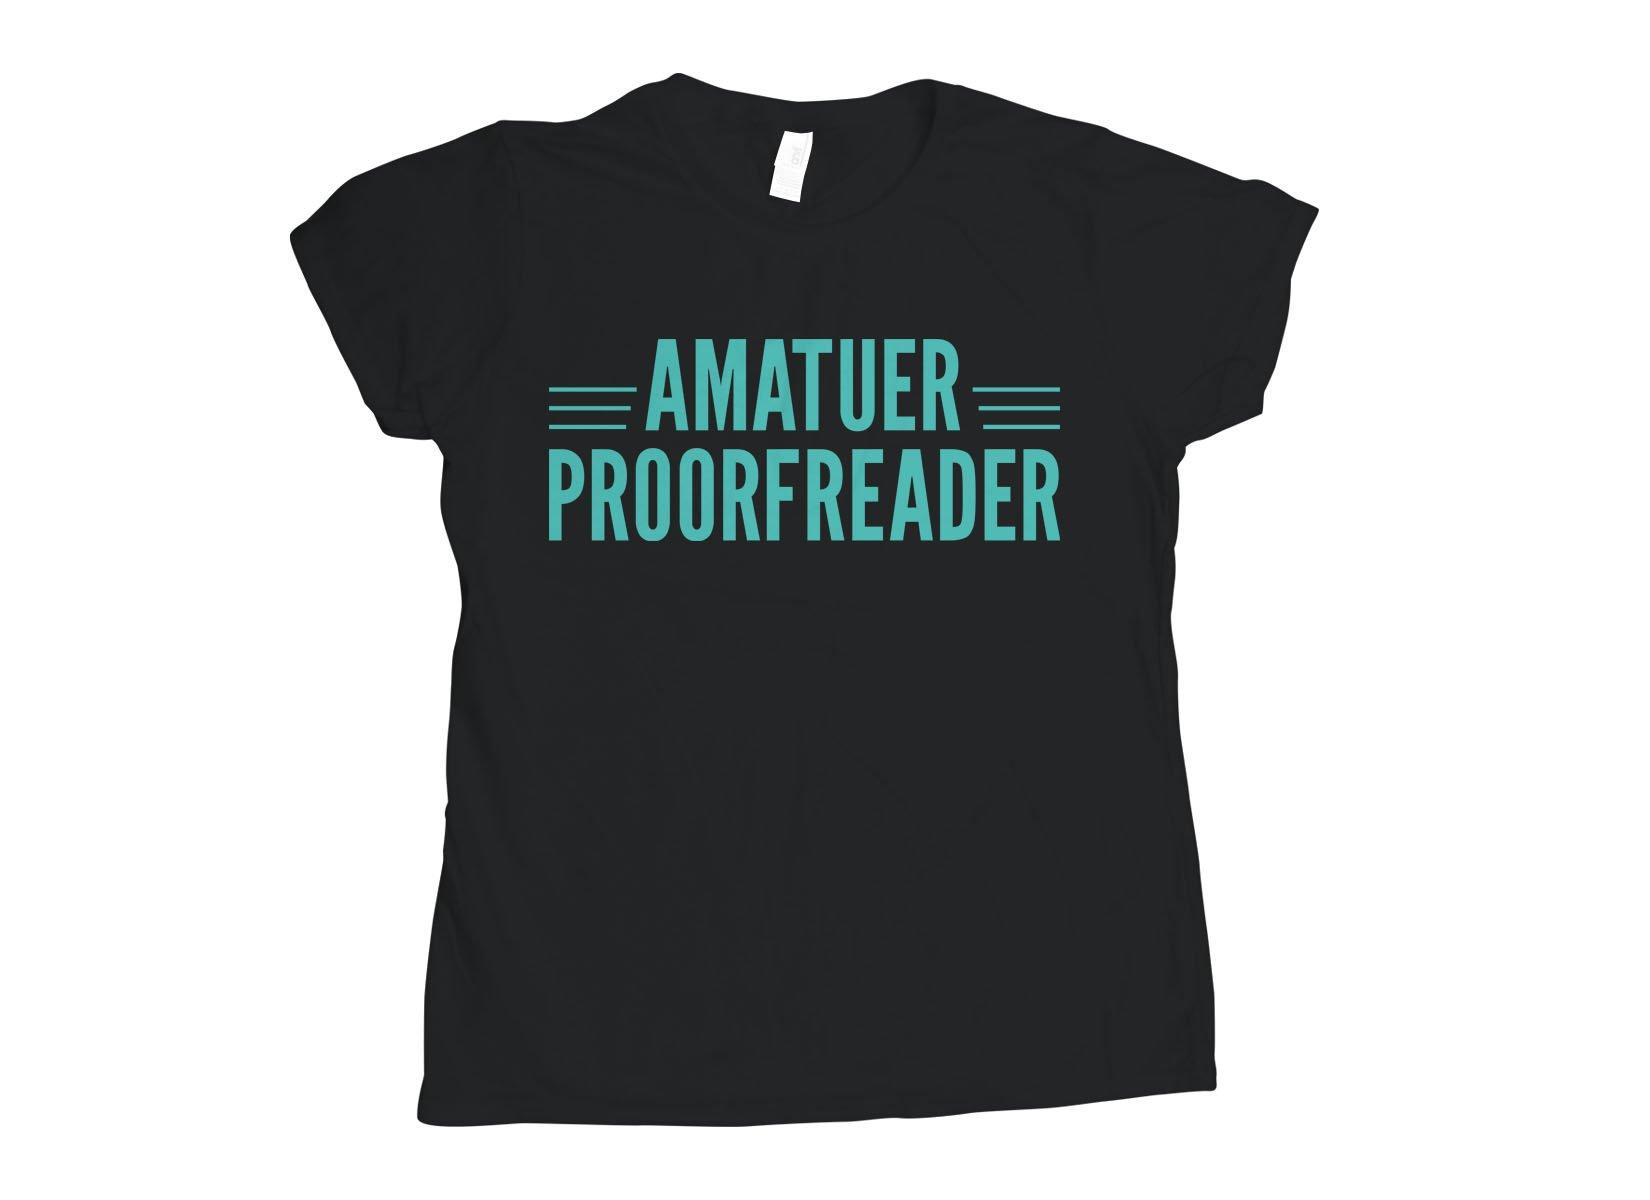 Amatuer Proorfeader on Womens T-Shirt